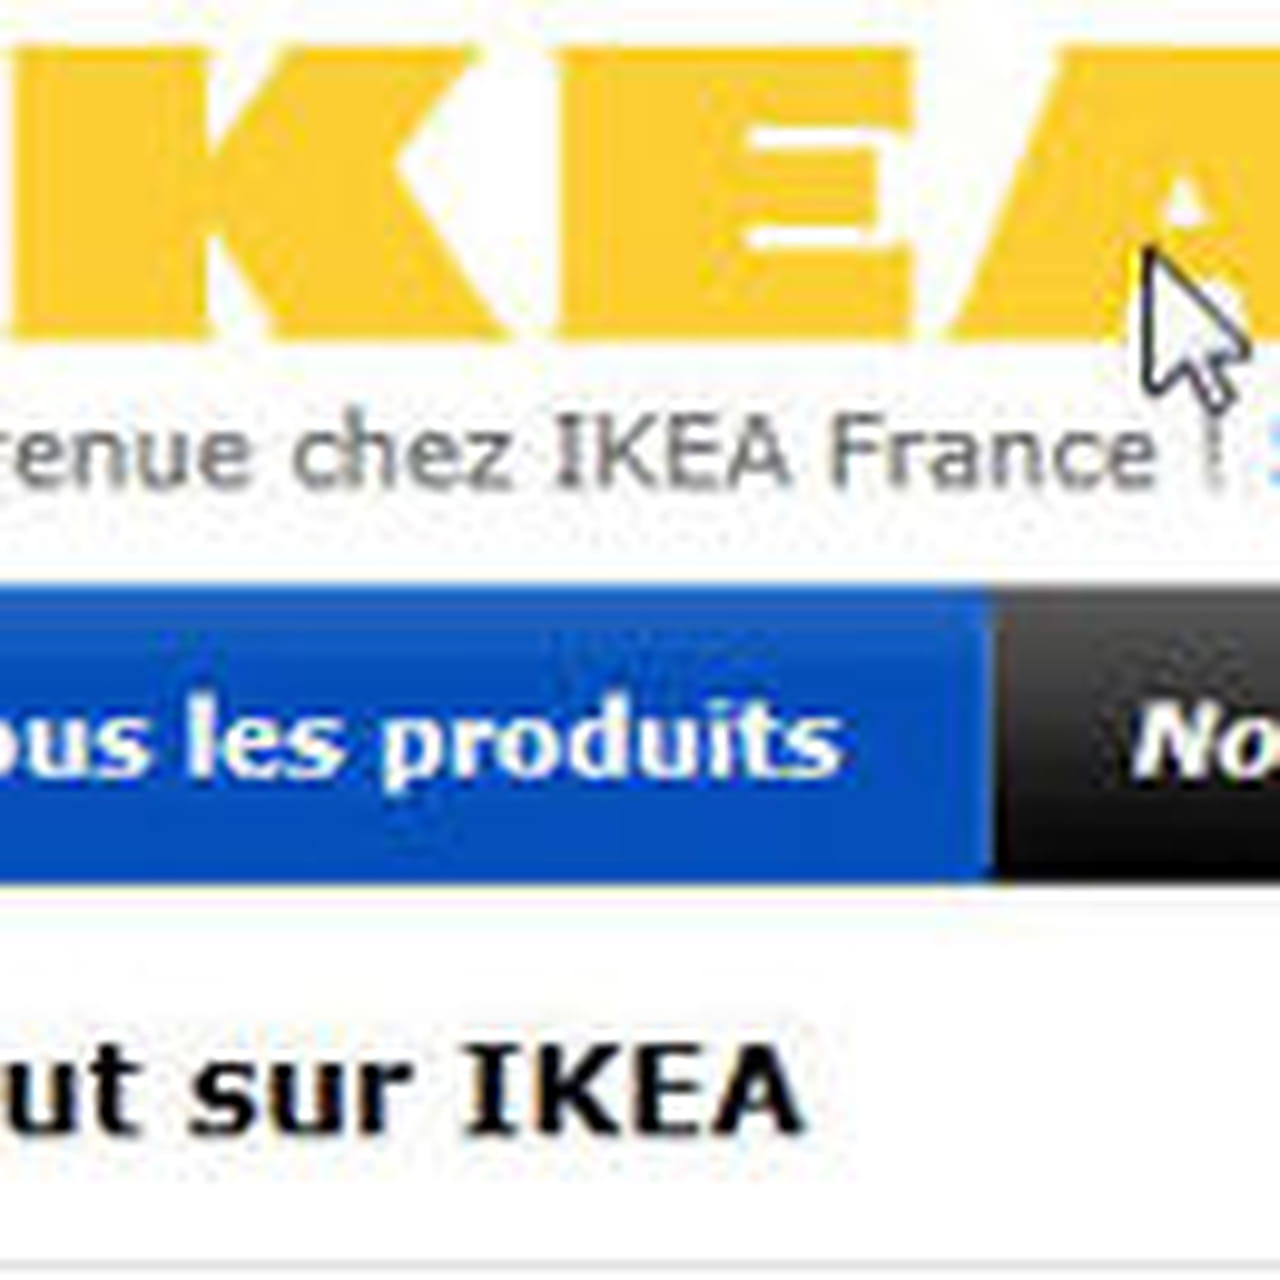 Armoires Retourner Sont À Elgå Les Fenstad Ikea v80mwNn